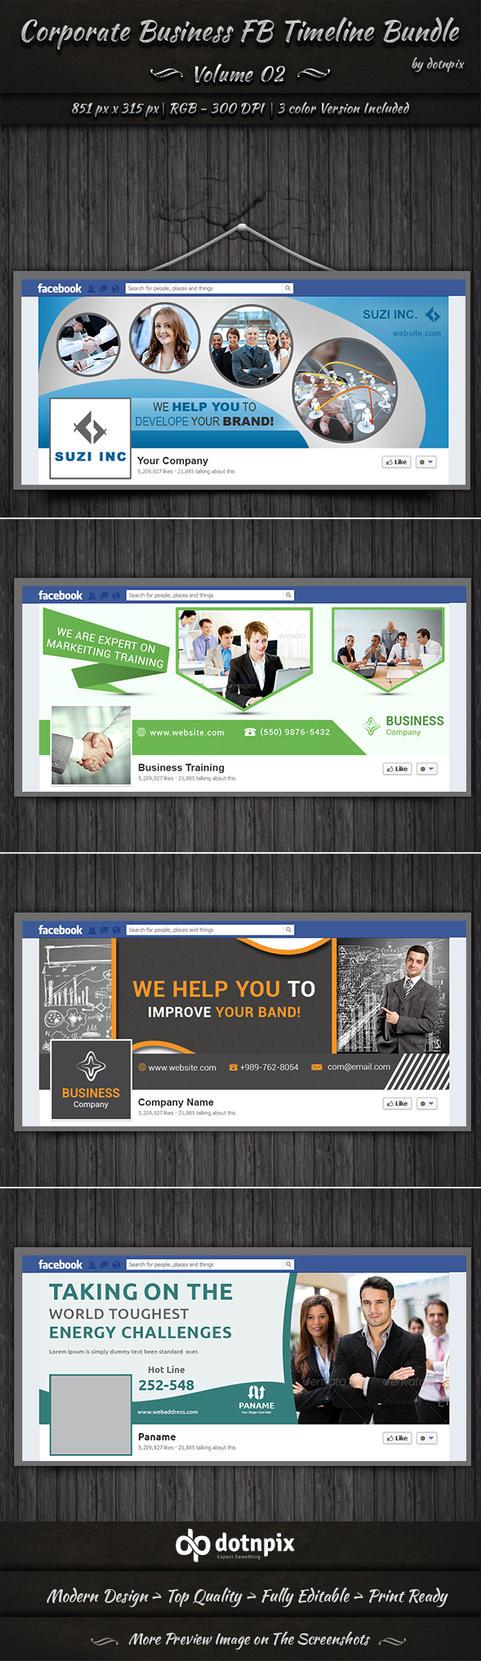 Corporate Business FB Timeline Bundle | Volume 2 by dotnpix